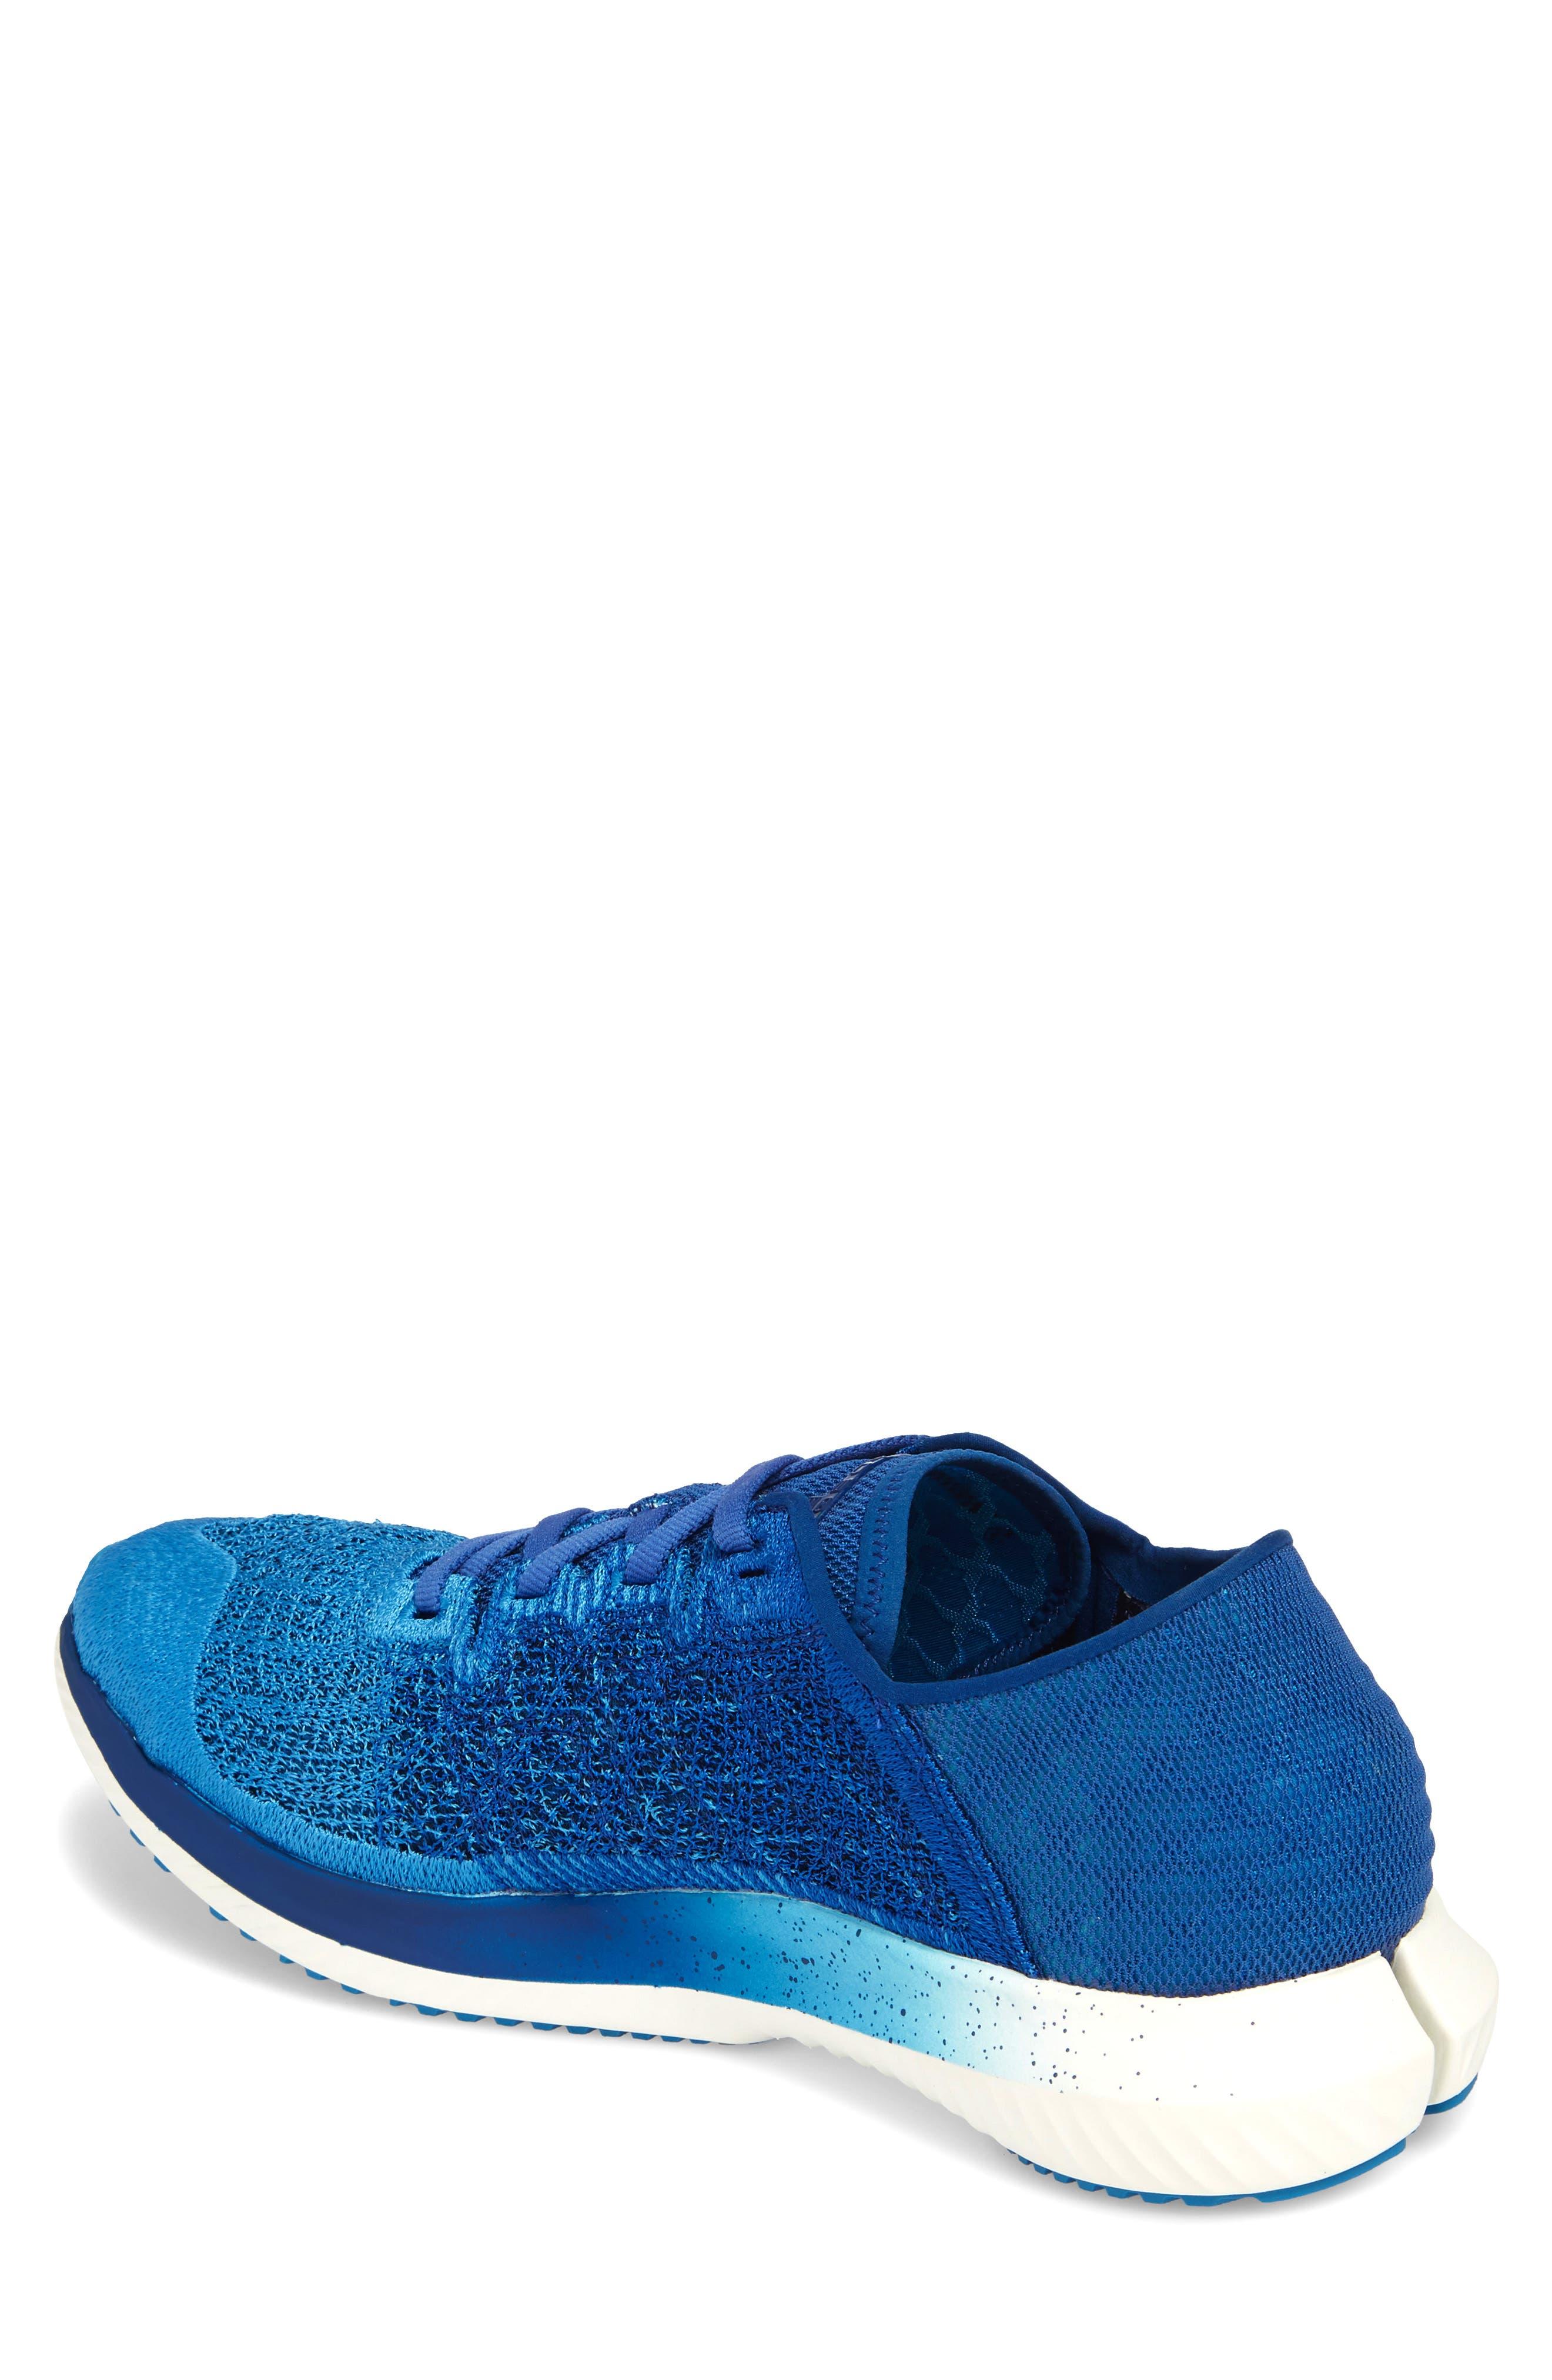 Threadborne Blur Running Shoe,                             Alternate thumbnail 2, color,                             BLUE / STUDIO